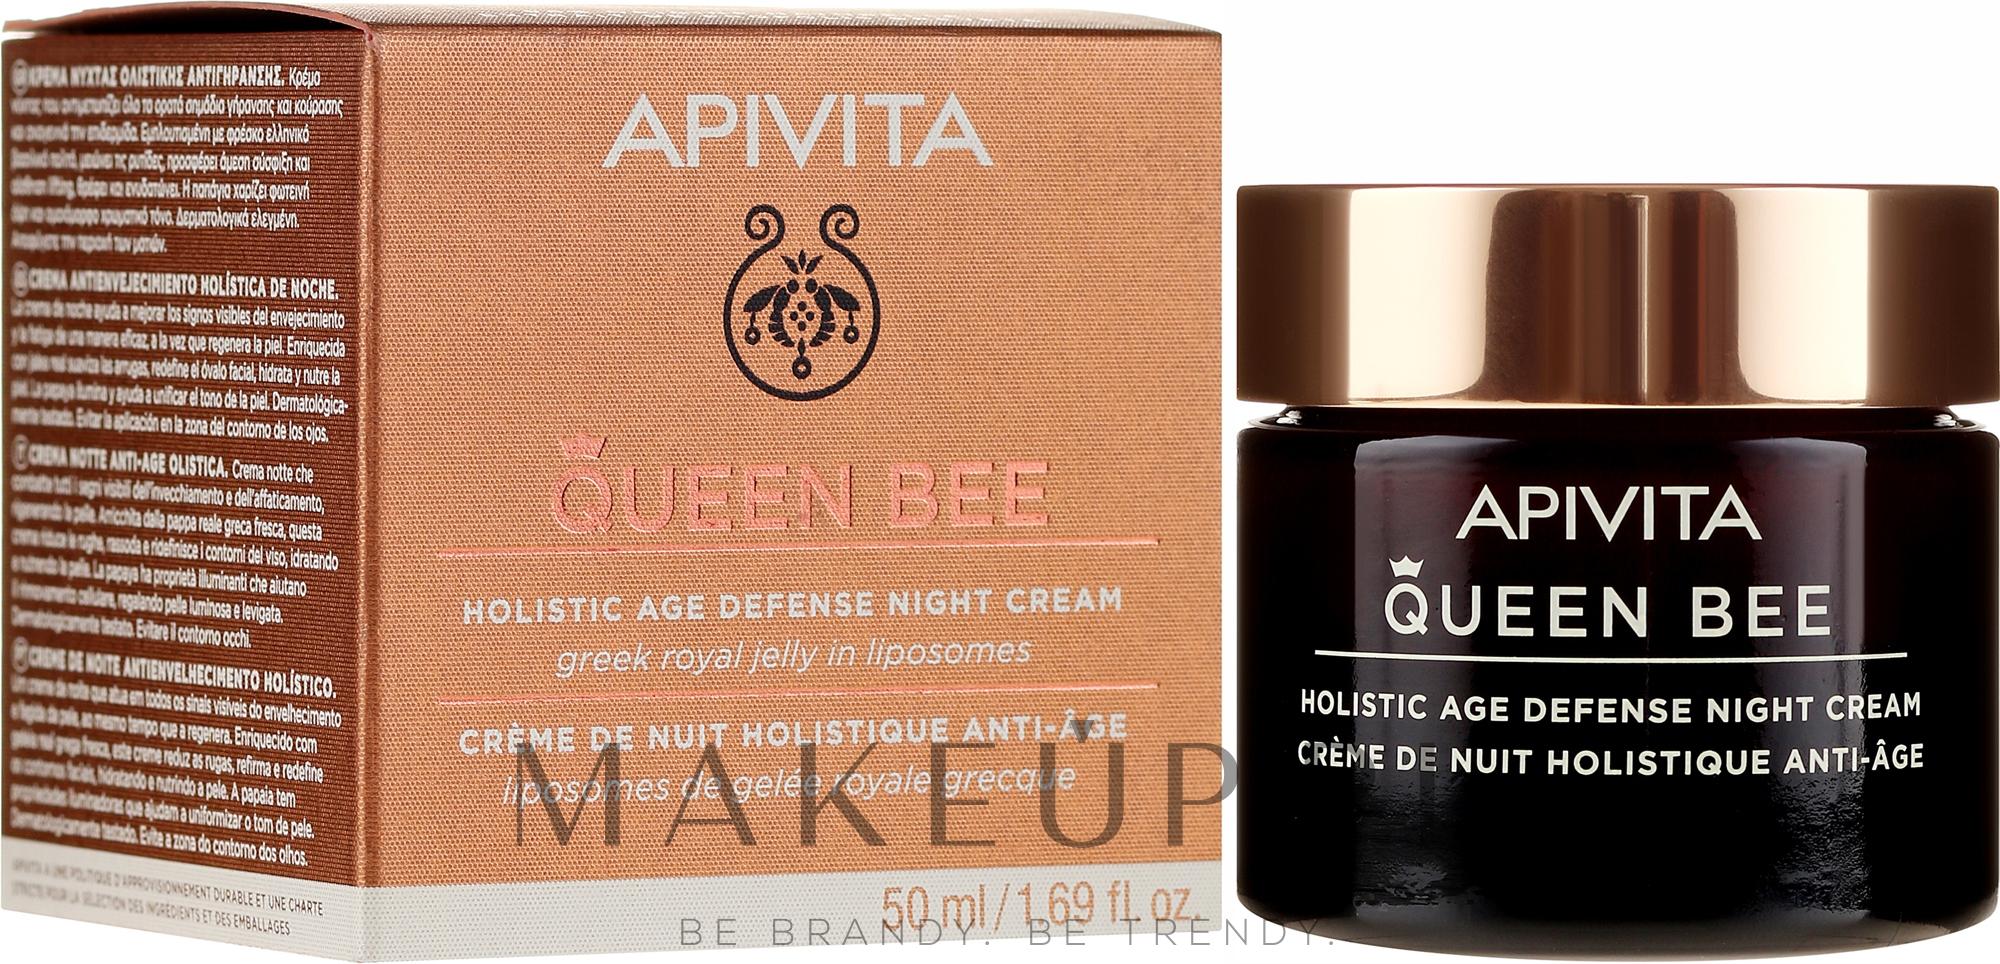 Przeciwstarzeniowy krem do twarzy na noc - Apivita Queen Bee Holistic Age Defense Night Cream — фото 50 ml